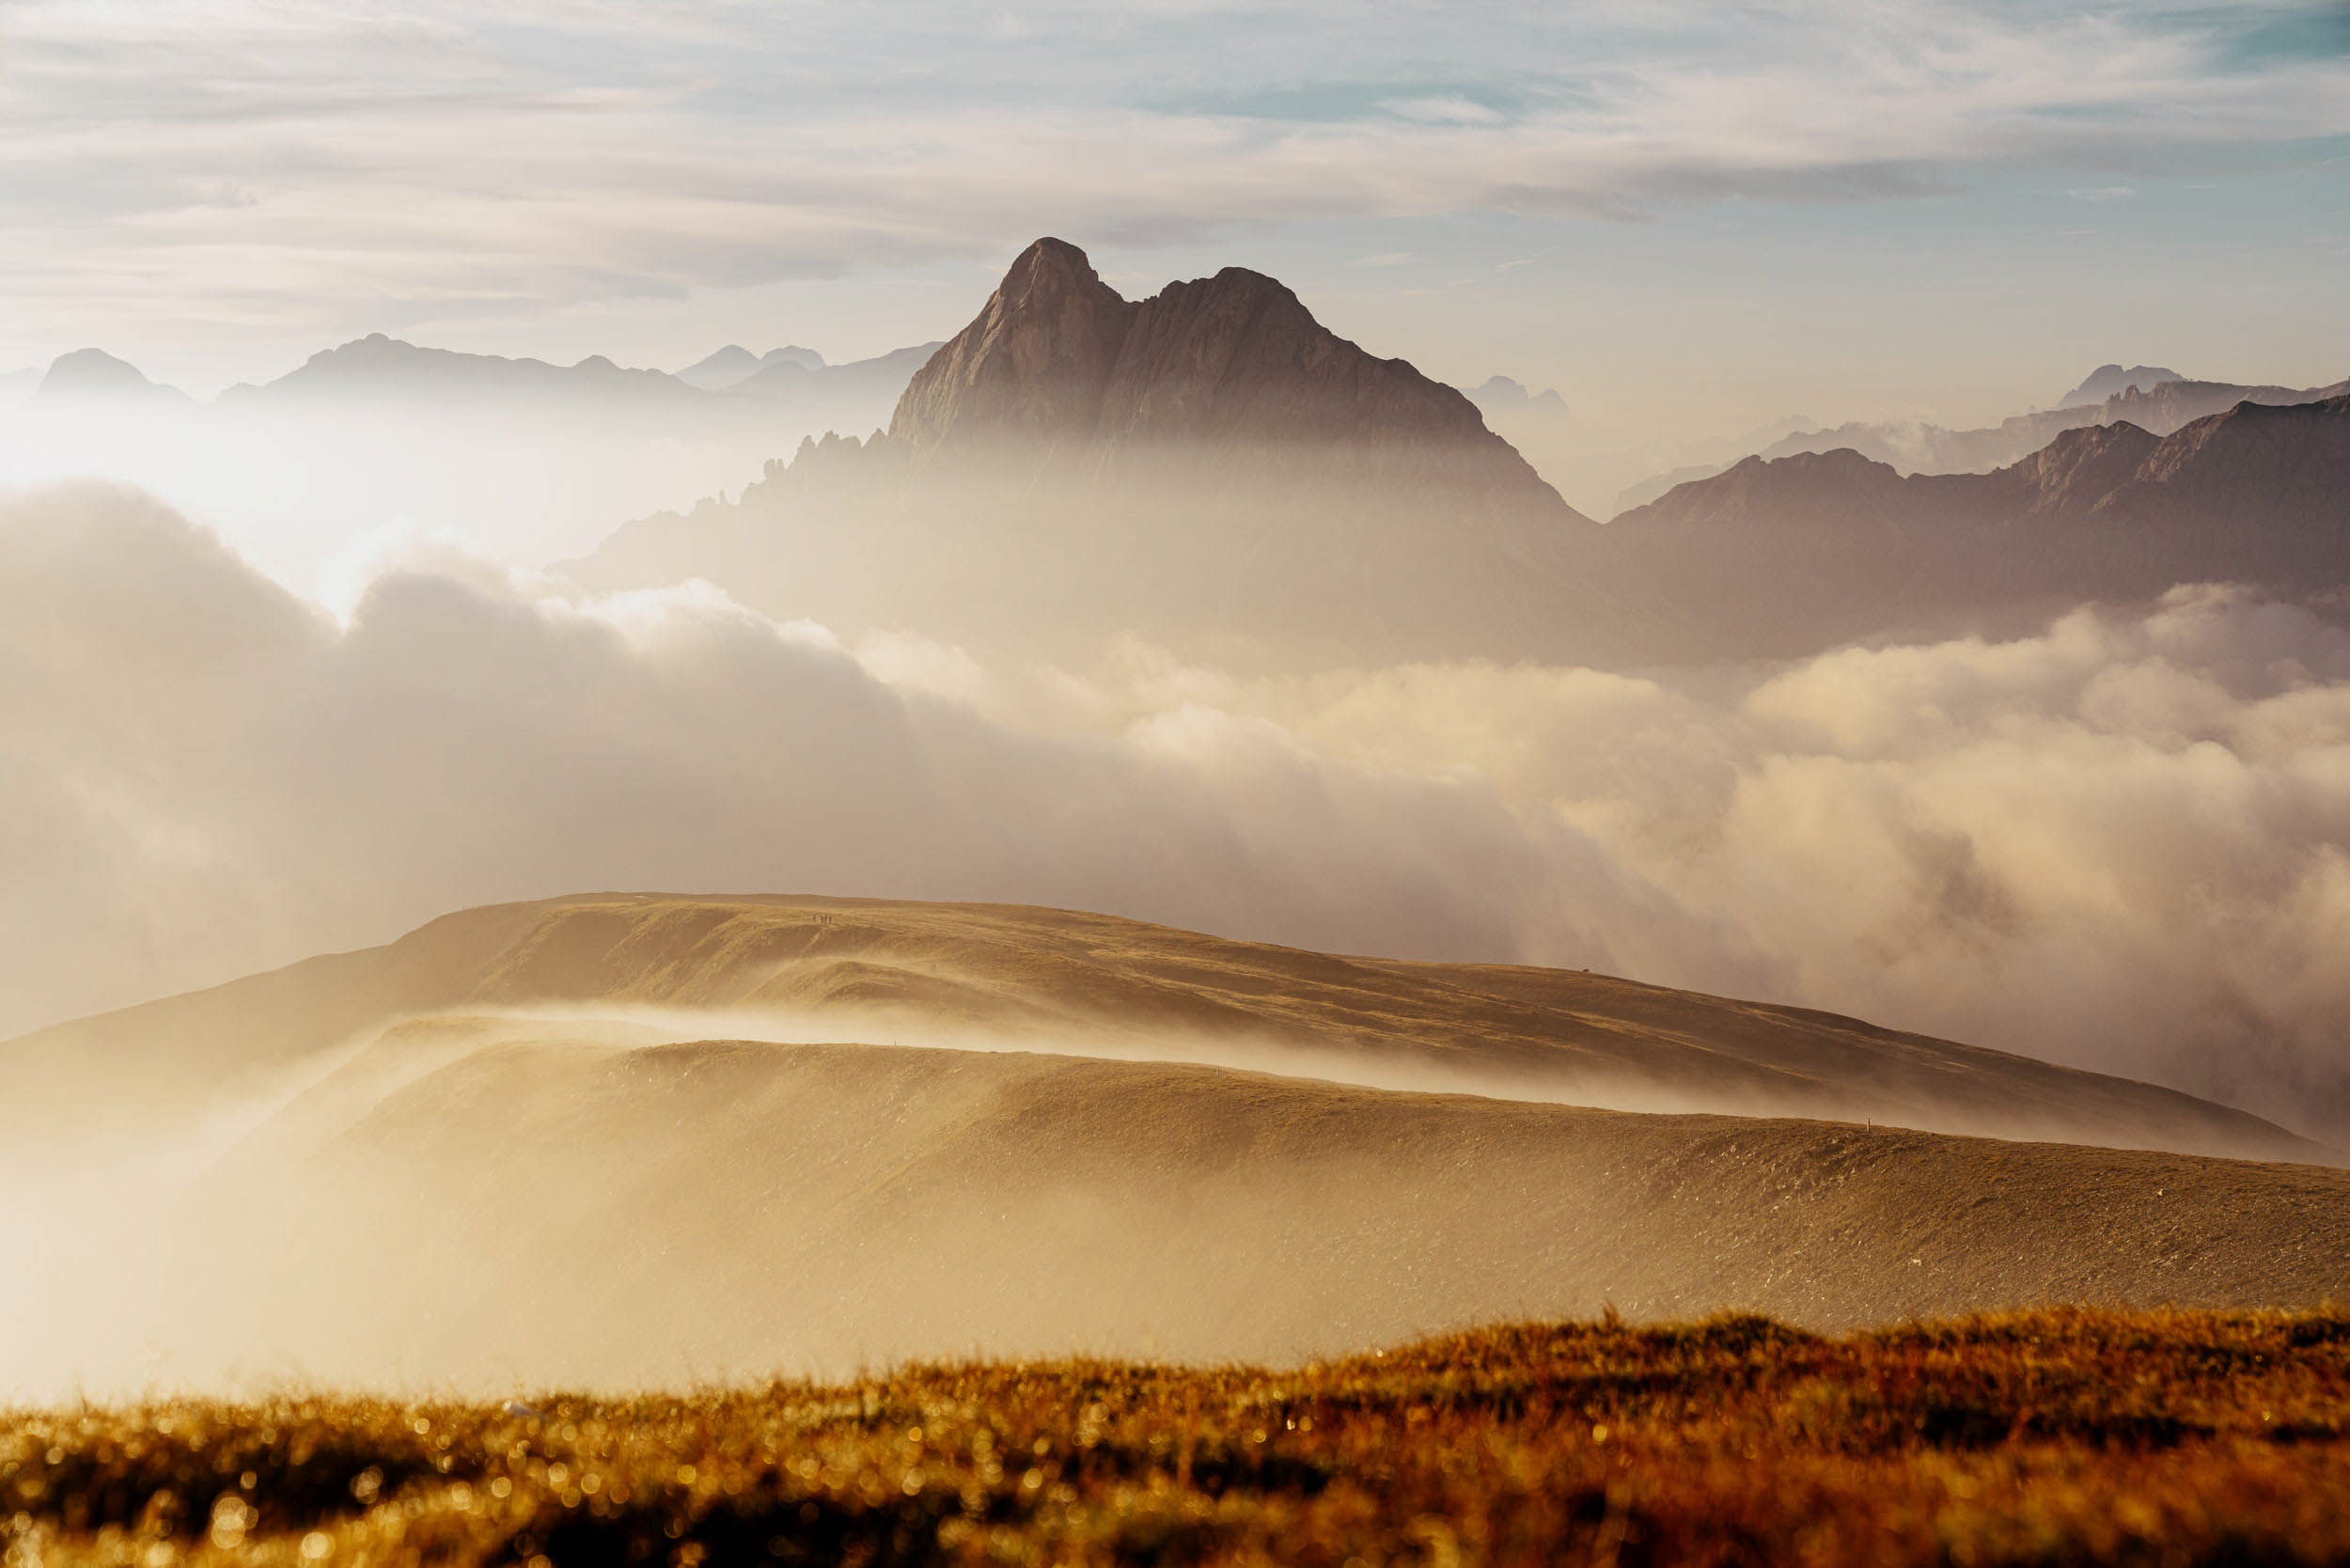 Landscape photography Roman Königshofer German Roamers landscape photographer mountain light